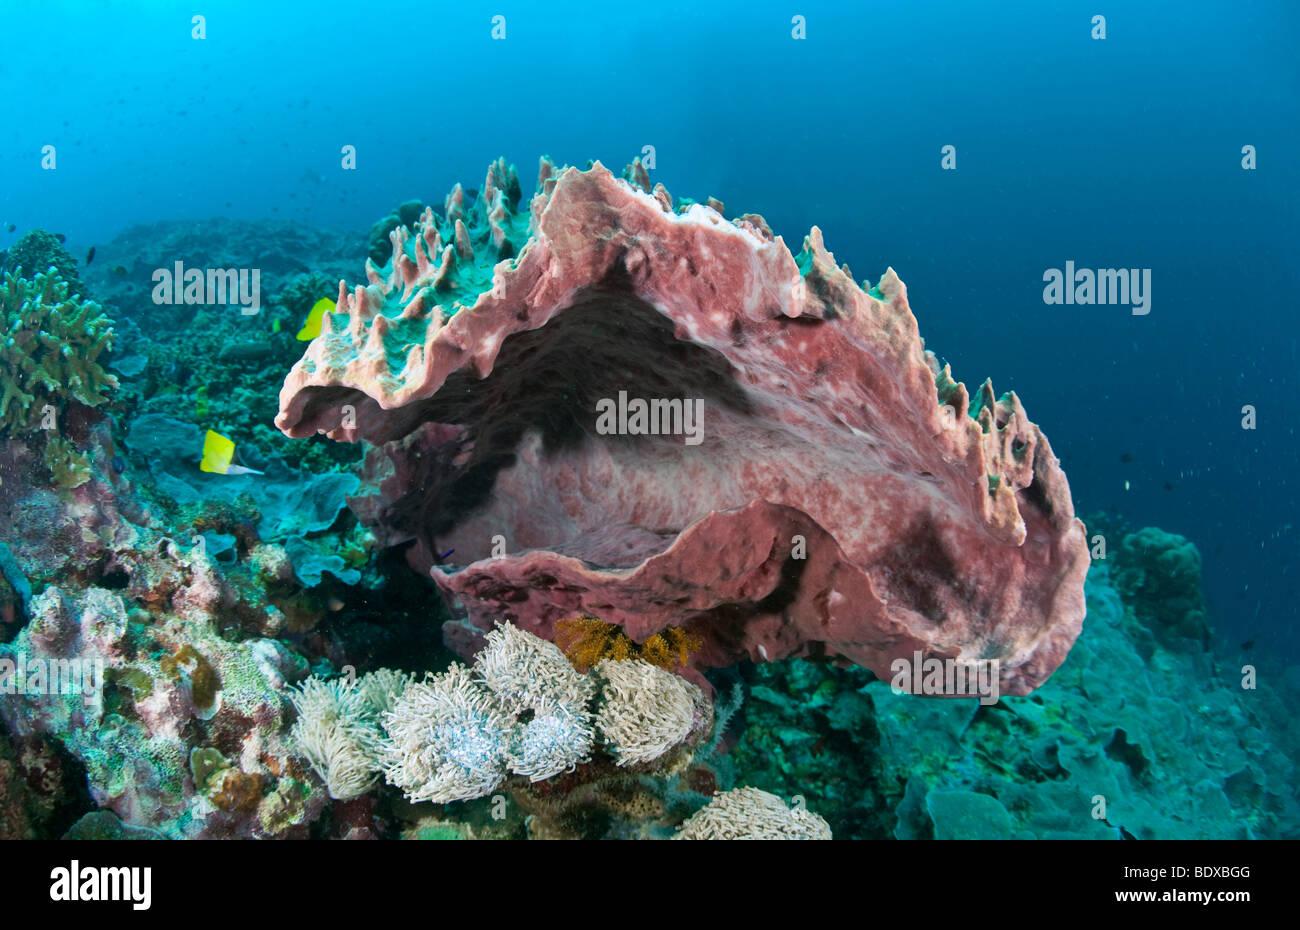 Giant barrel sponge (Xestospongia testudinaria), Indonesia - Stock Image